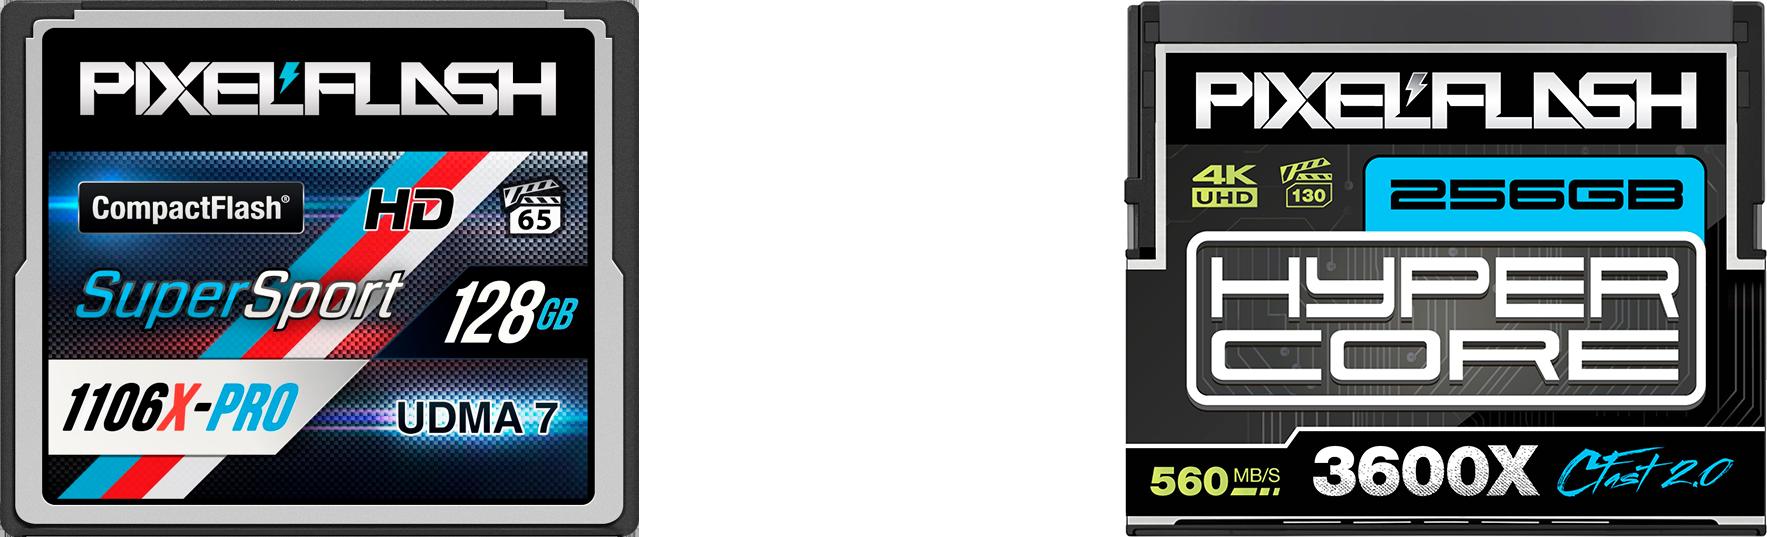 PixelFlash Data Recovery